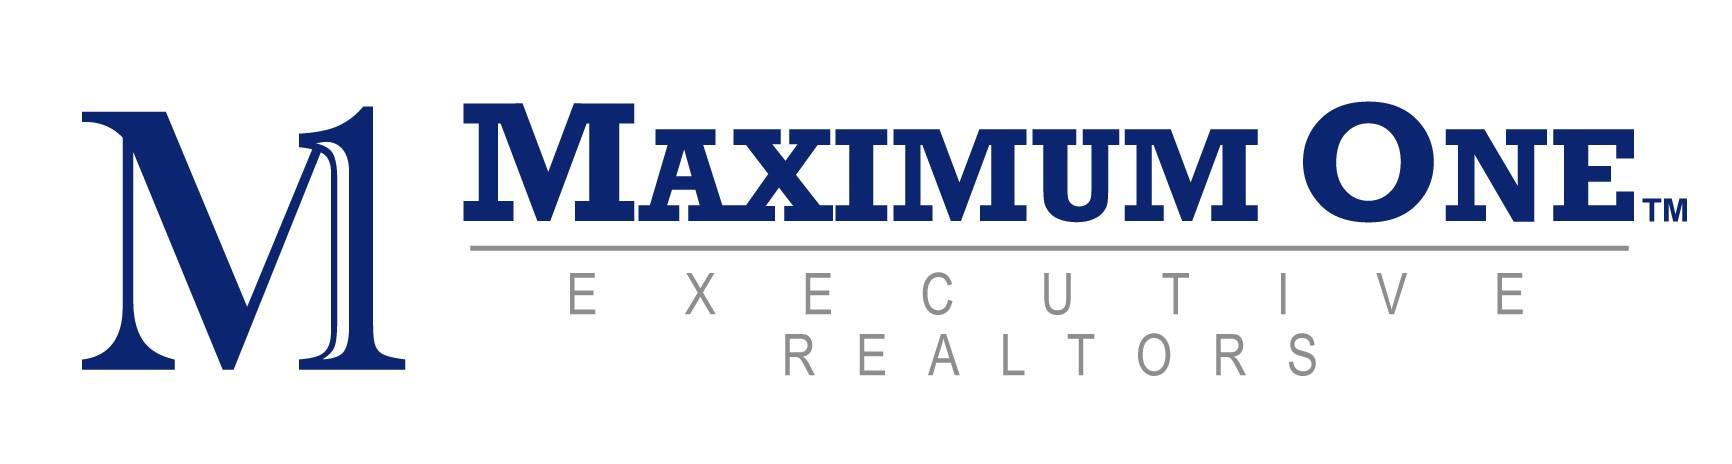 Maximum One Realty Executives